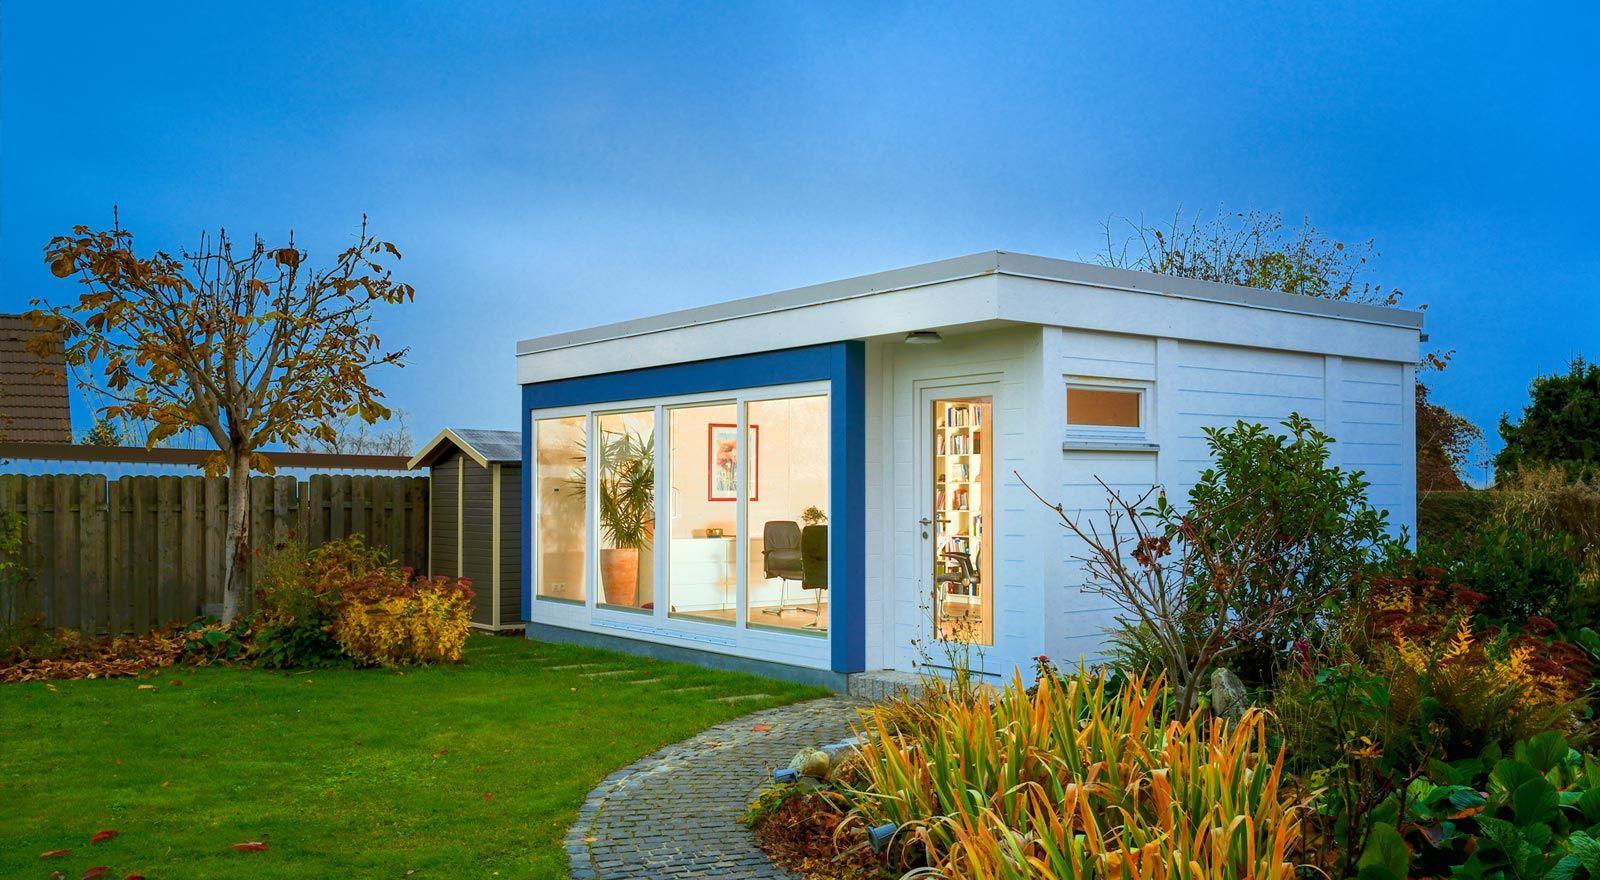 hummel modernes gartenhaus sucasa moderne gartenh user. Black Bedroom Furniture Sets. Home Design Ideas